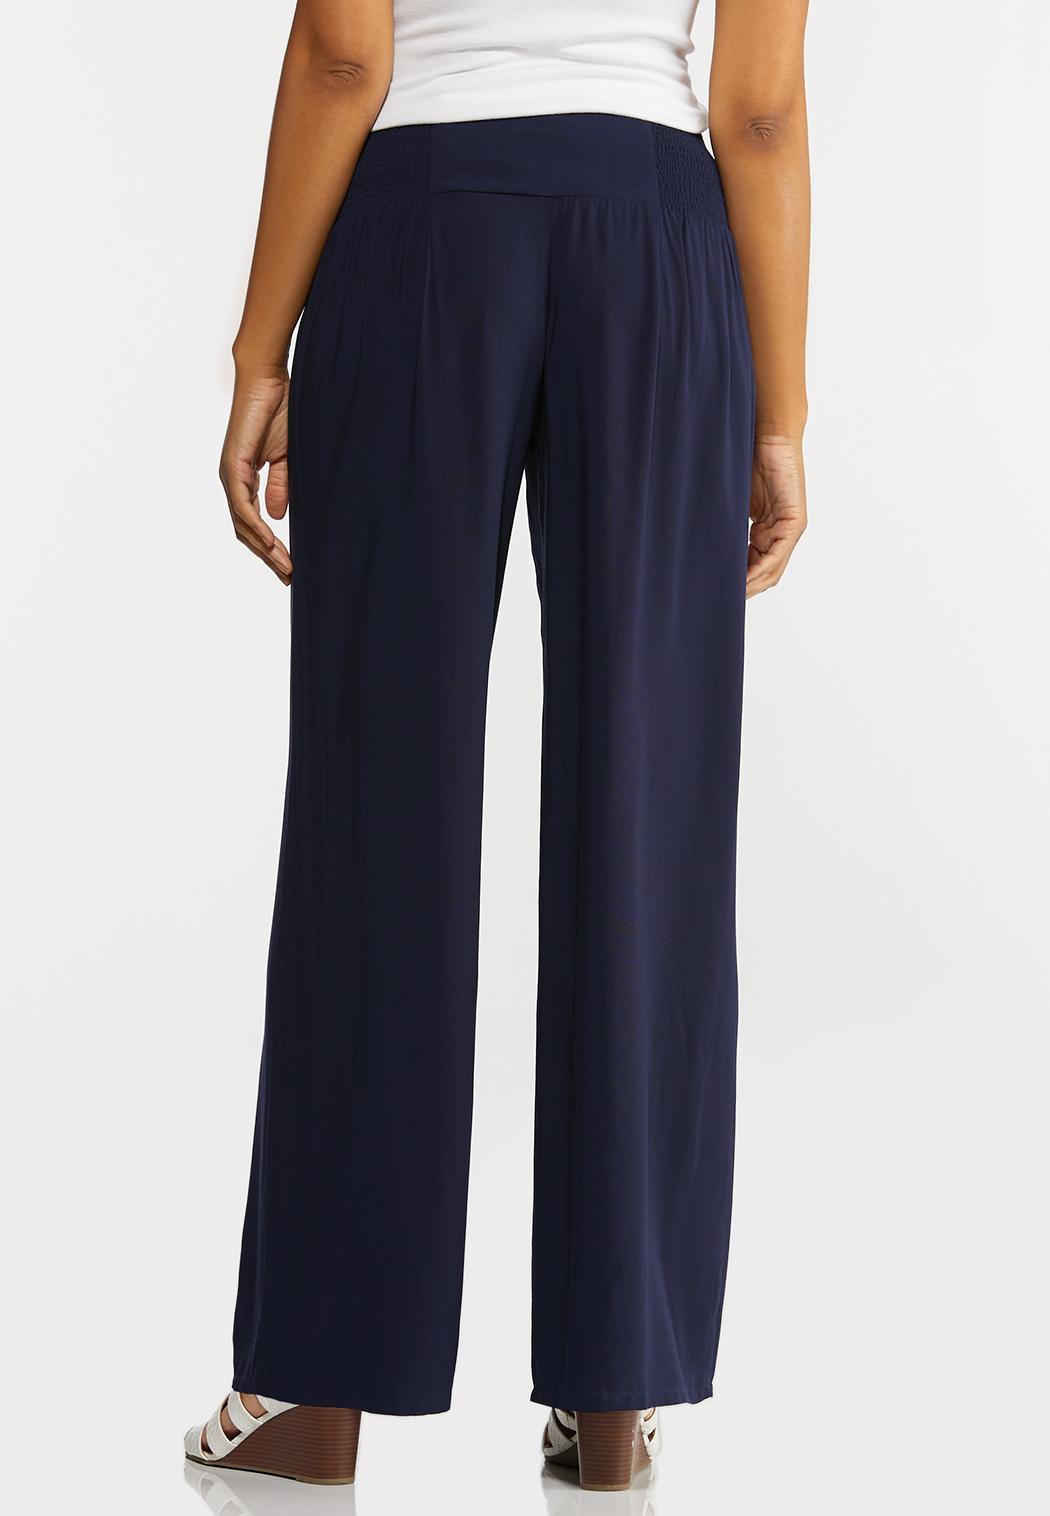 Smocked Button Pants (Item #44289281)